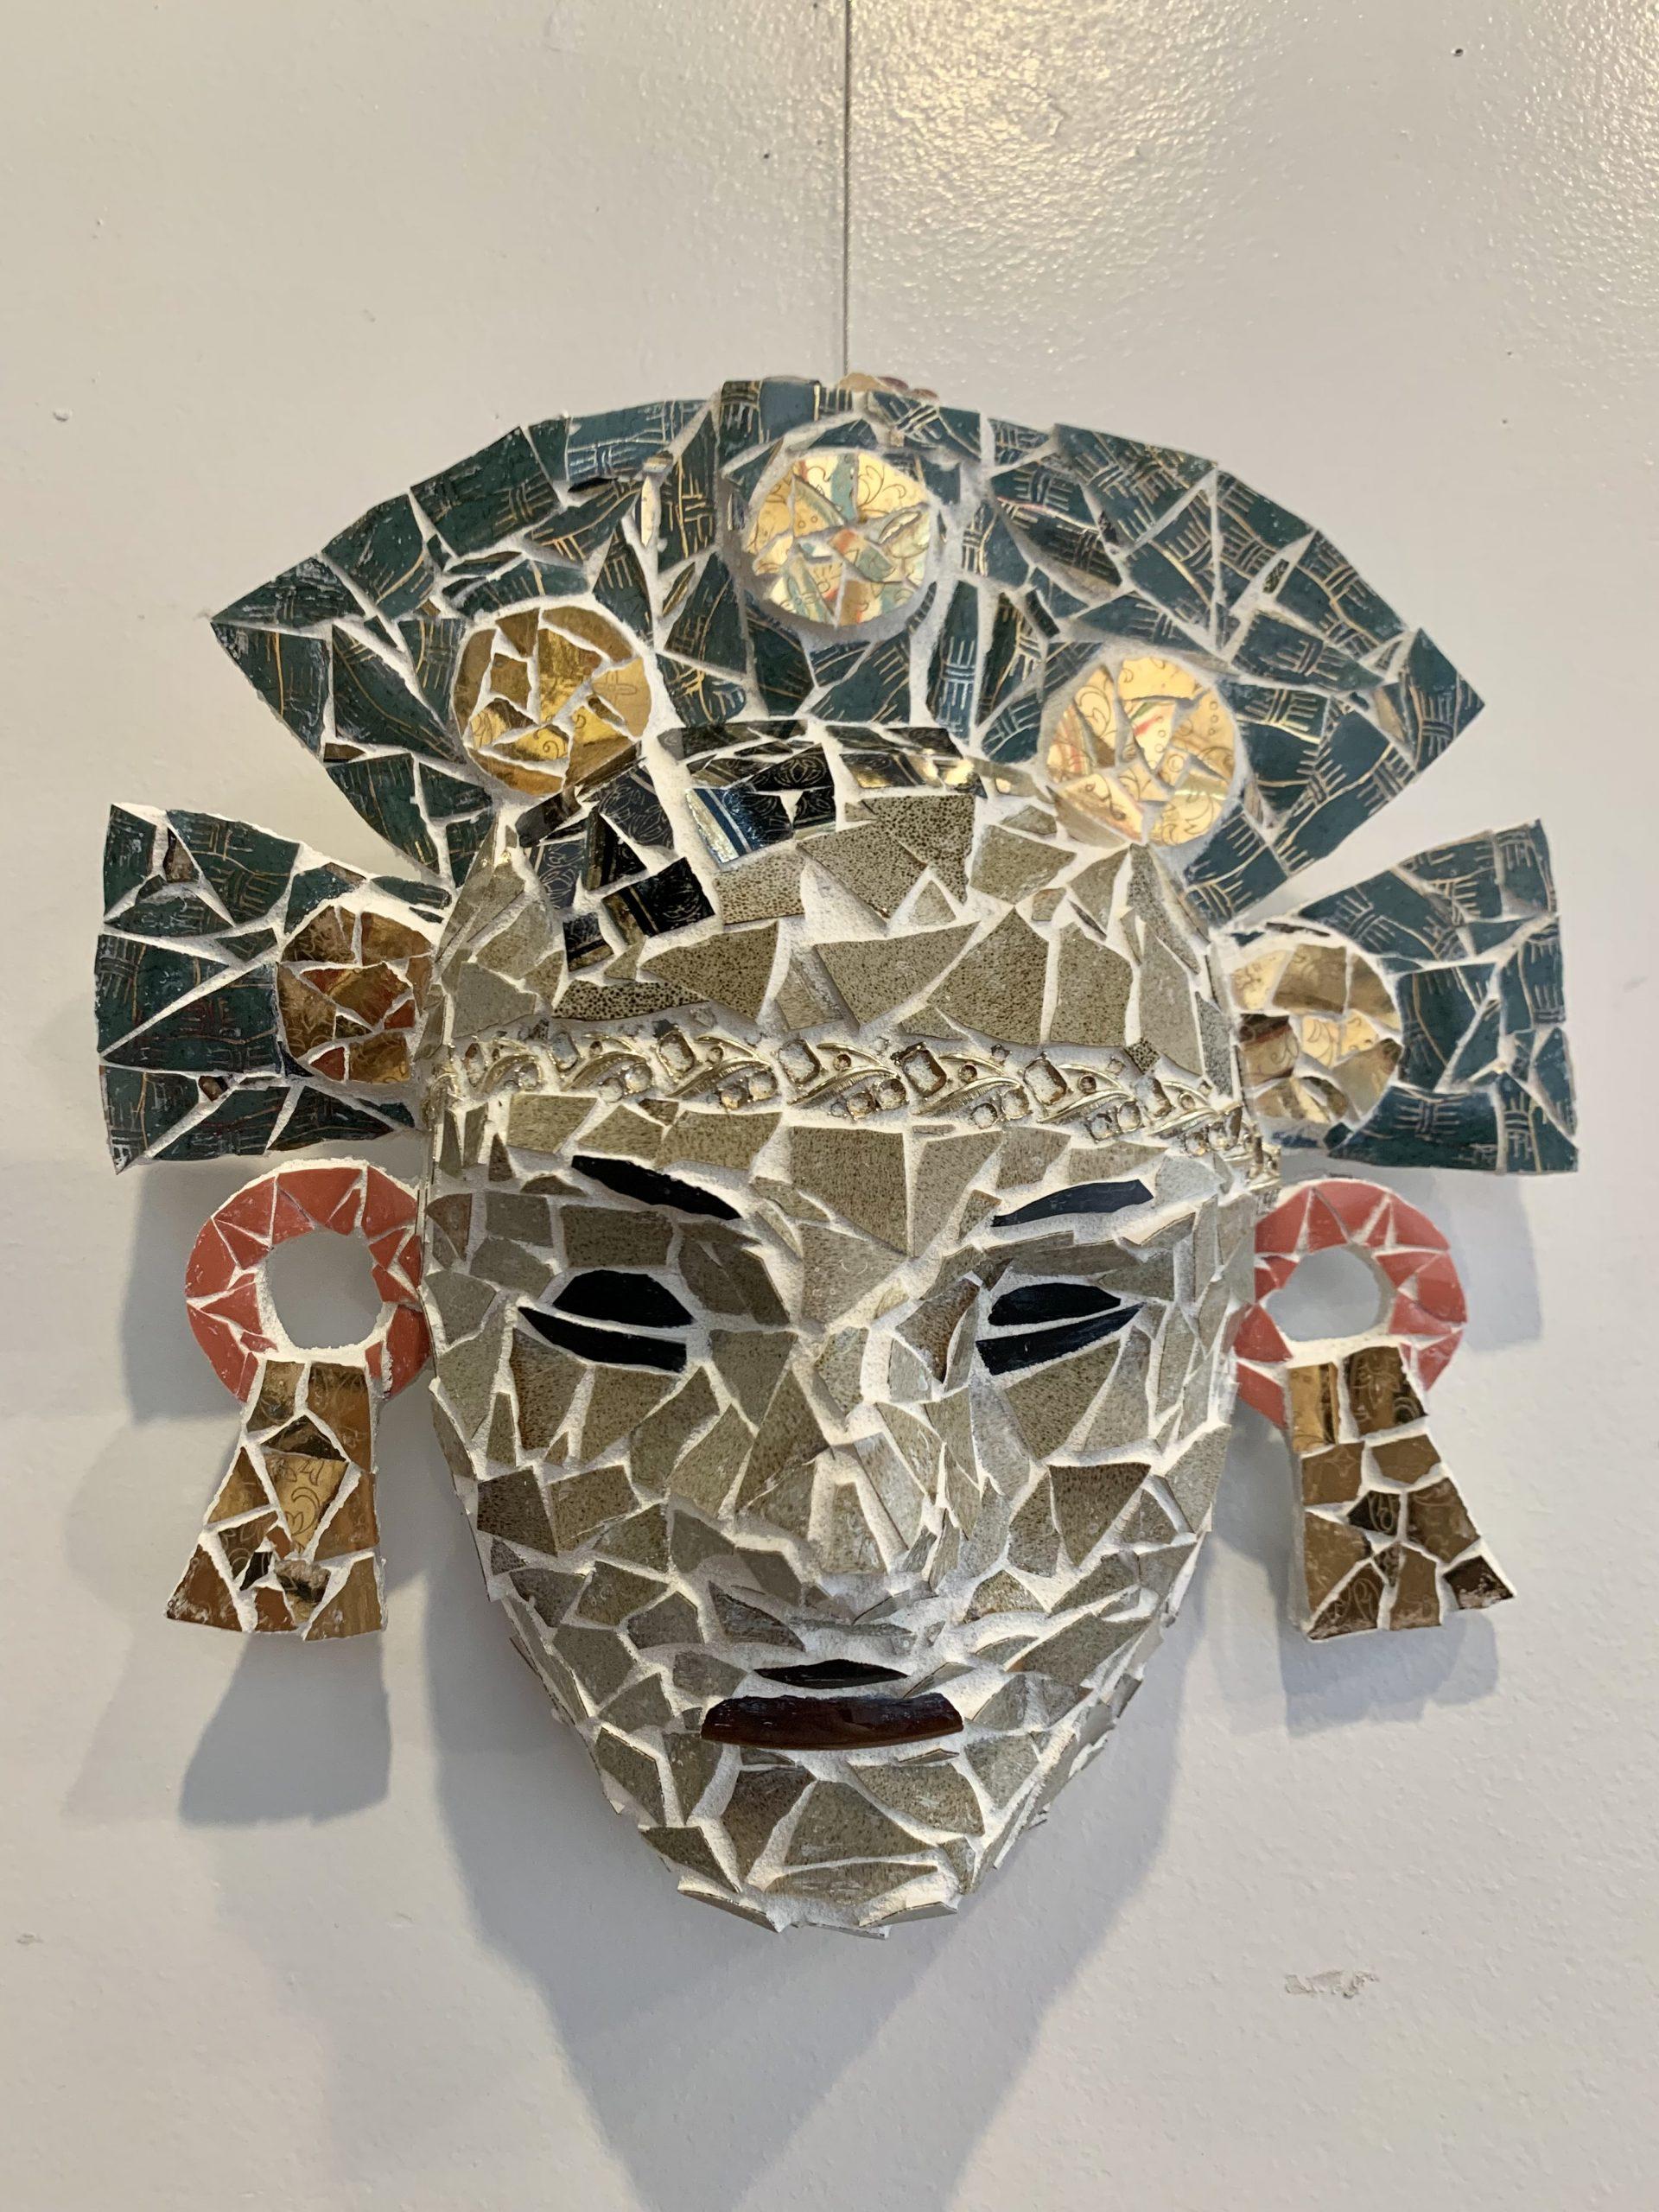 Artist #7 - Mayan Mask 3